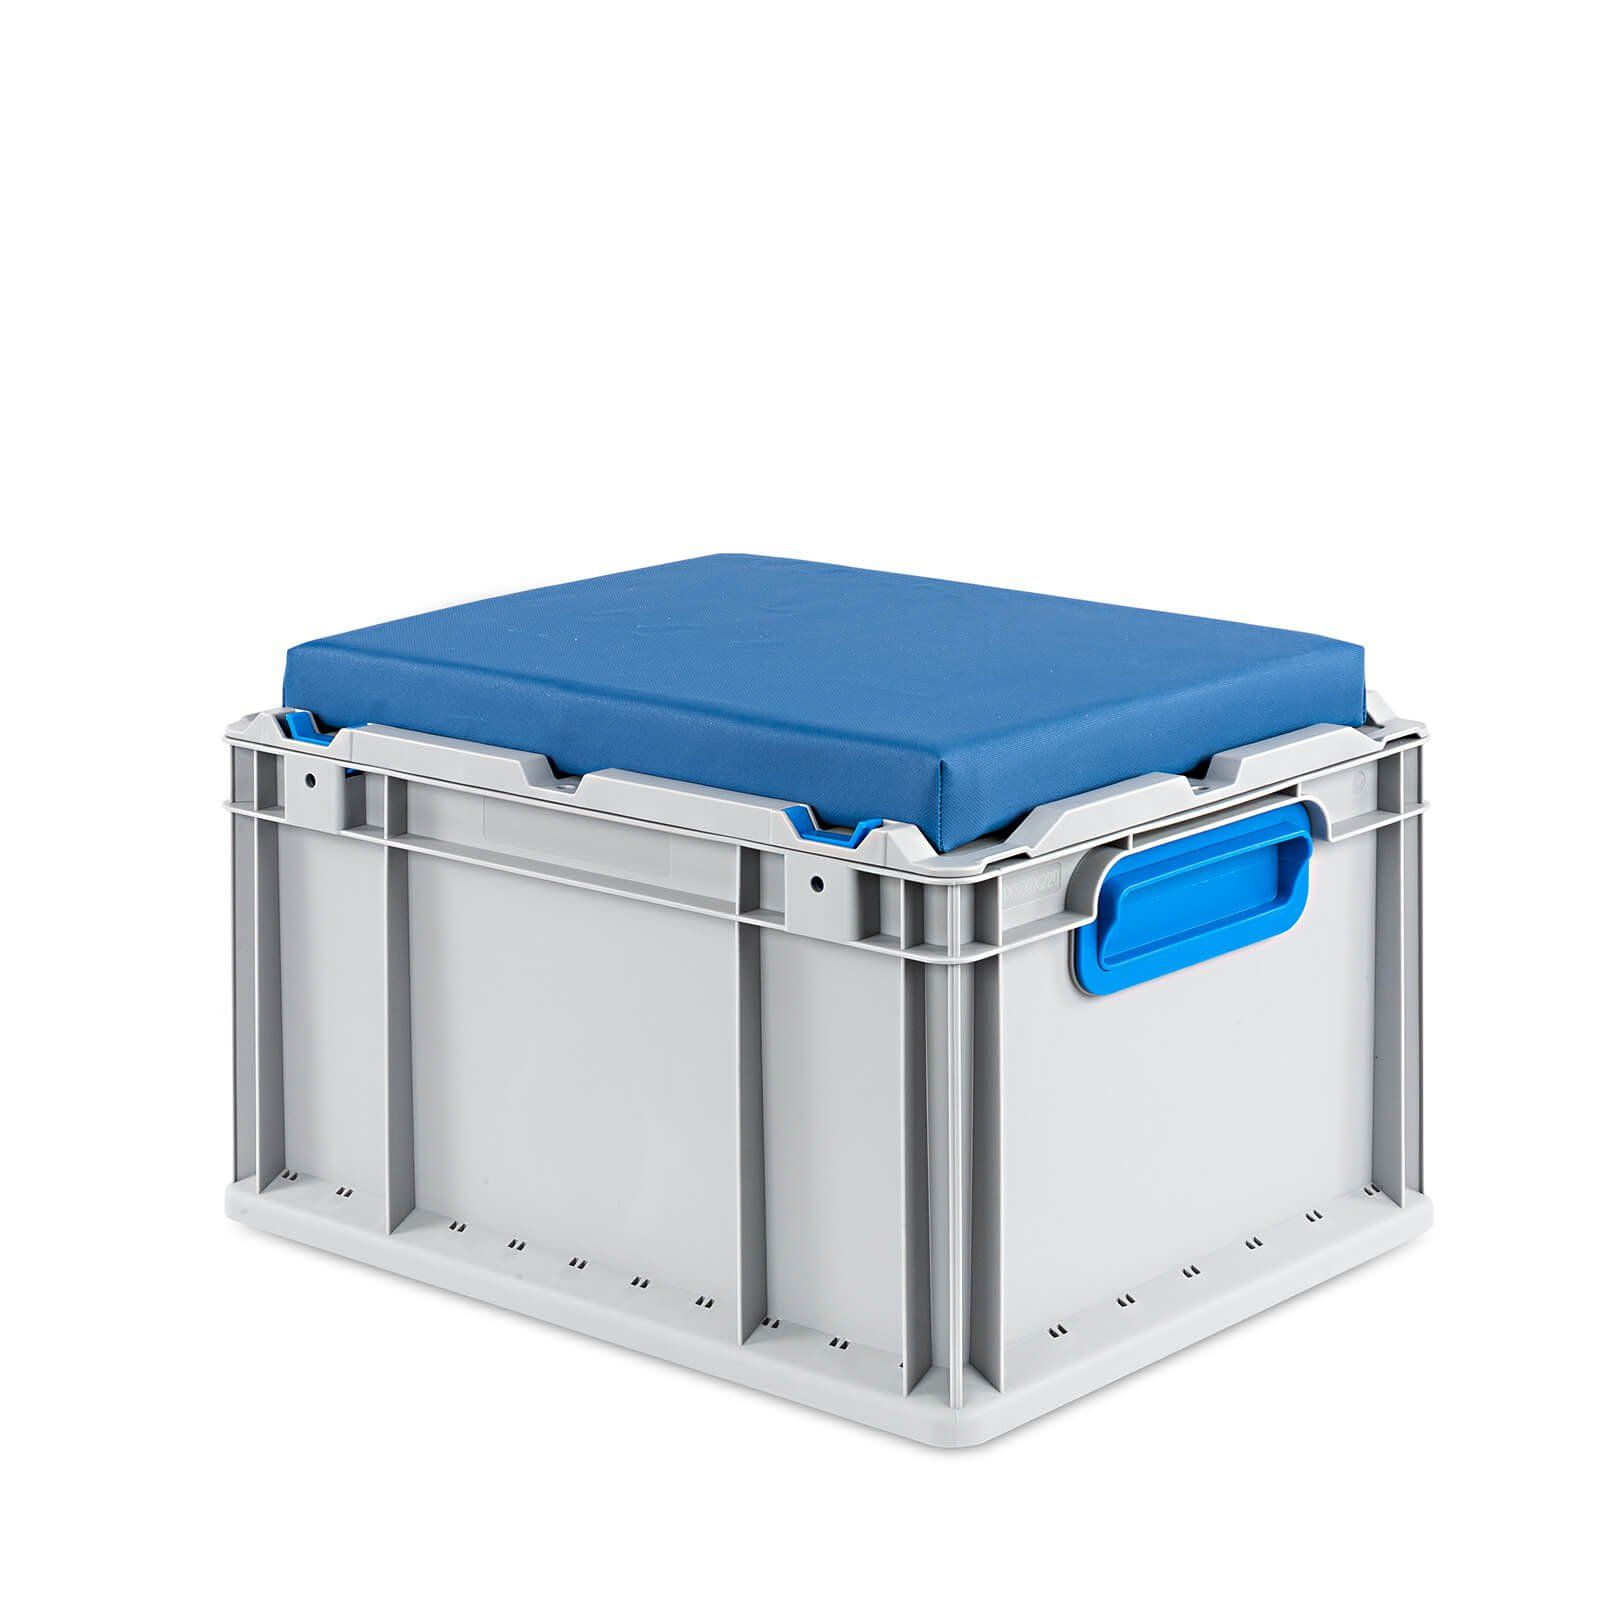 eurobox nextgen seat box griffe geschlossen 43 22 camper van diy camping tours camper. Black Bedroom Furniture Sets. Home Design Ideas